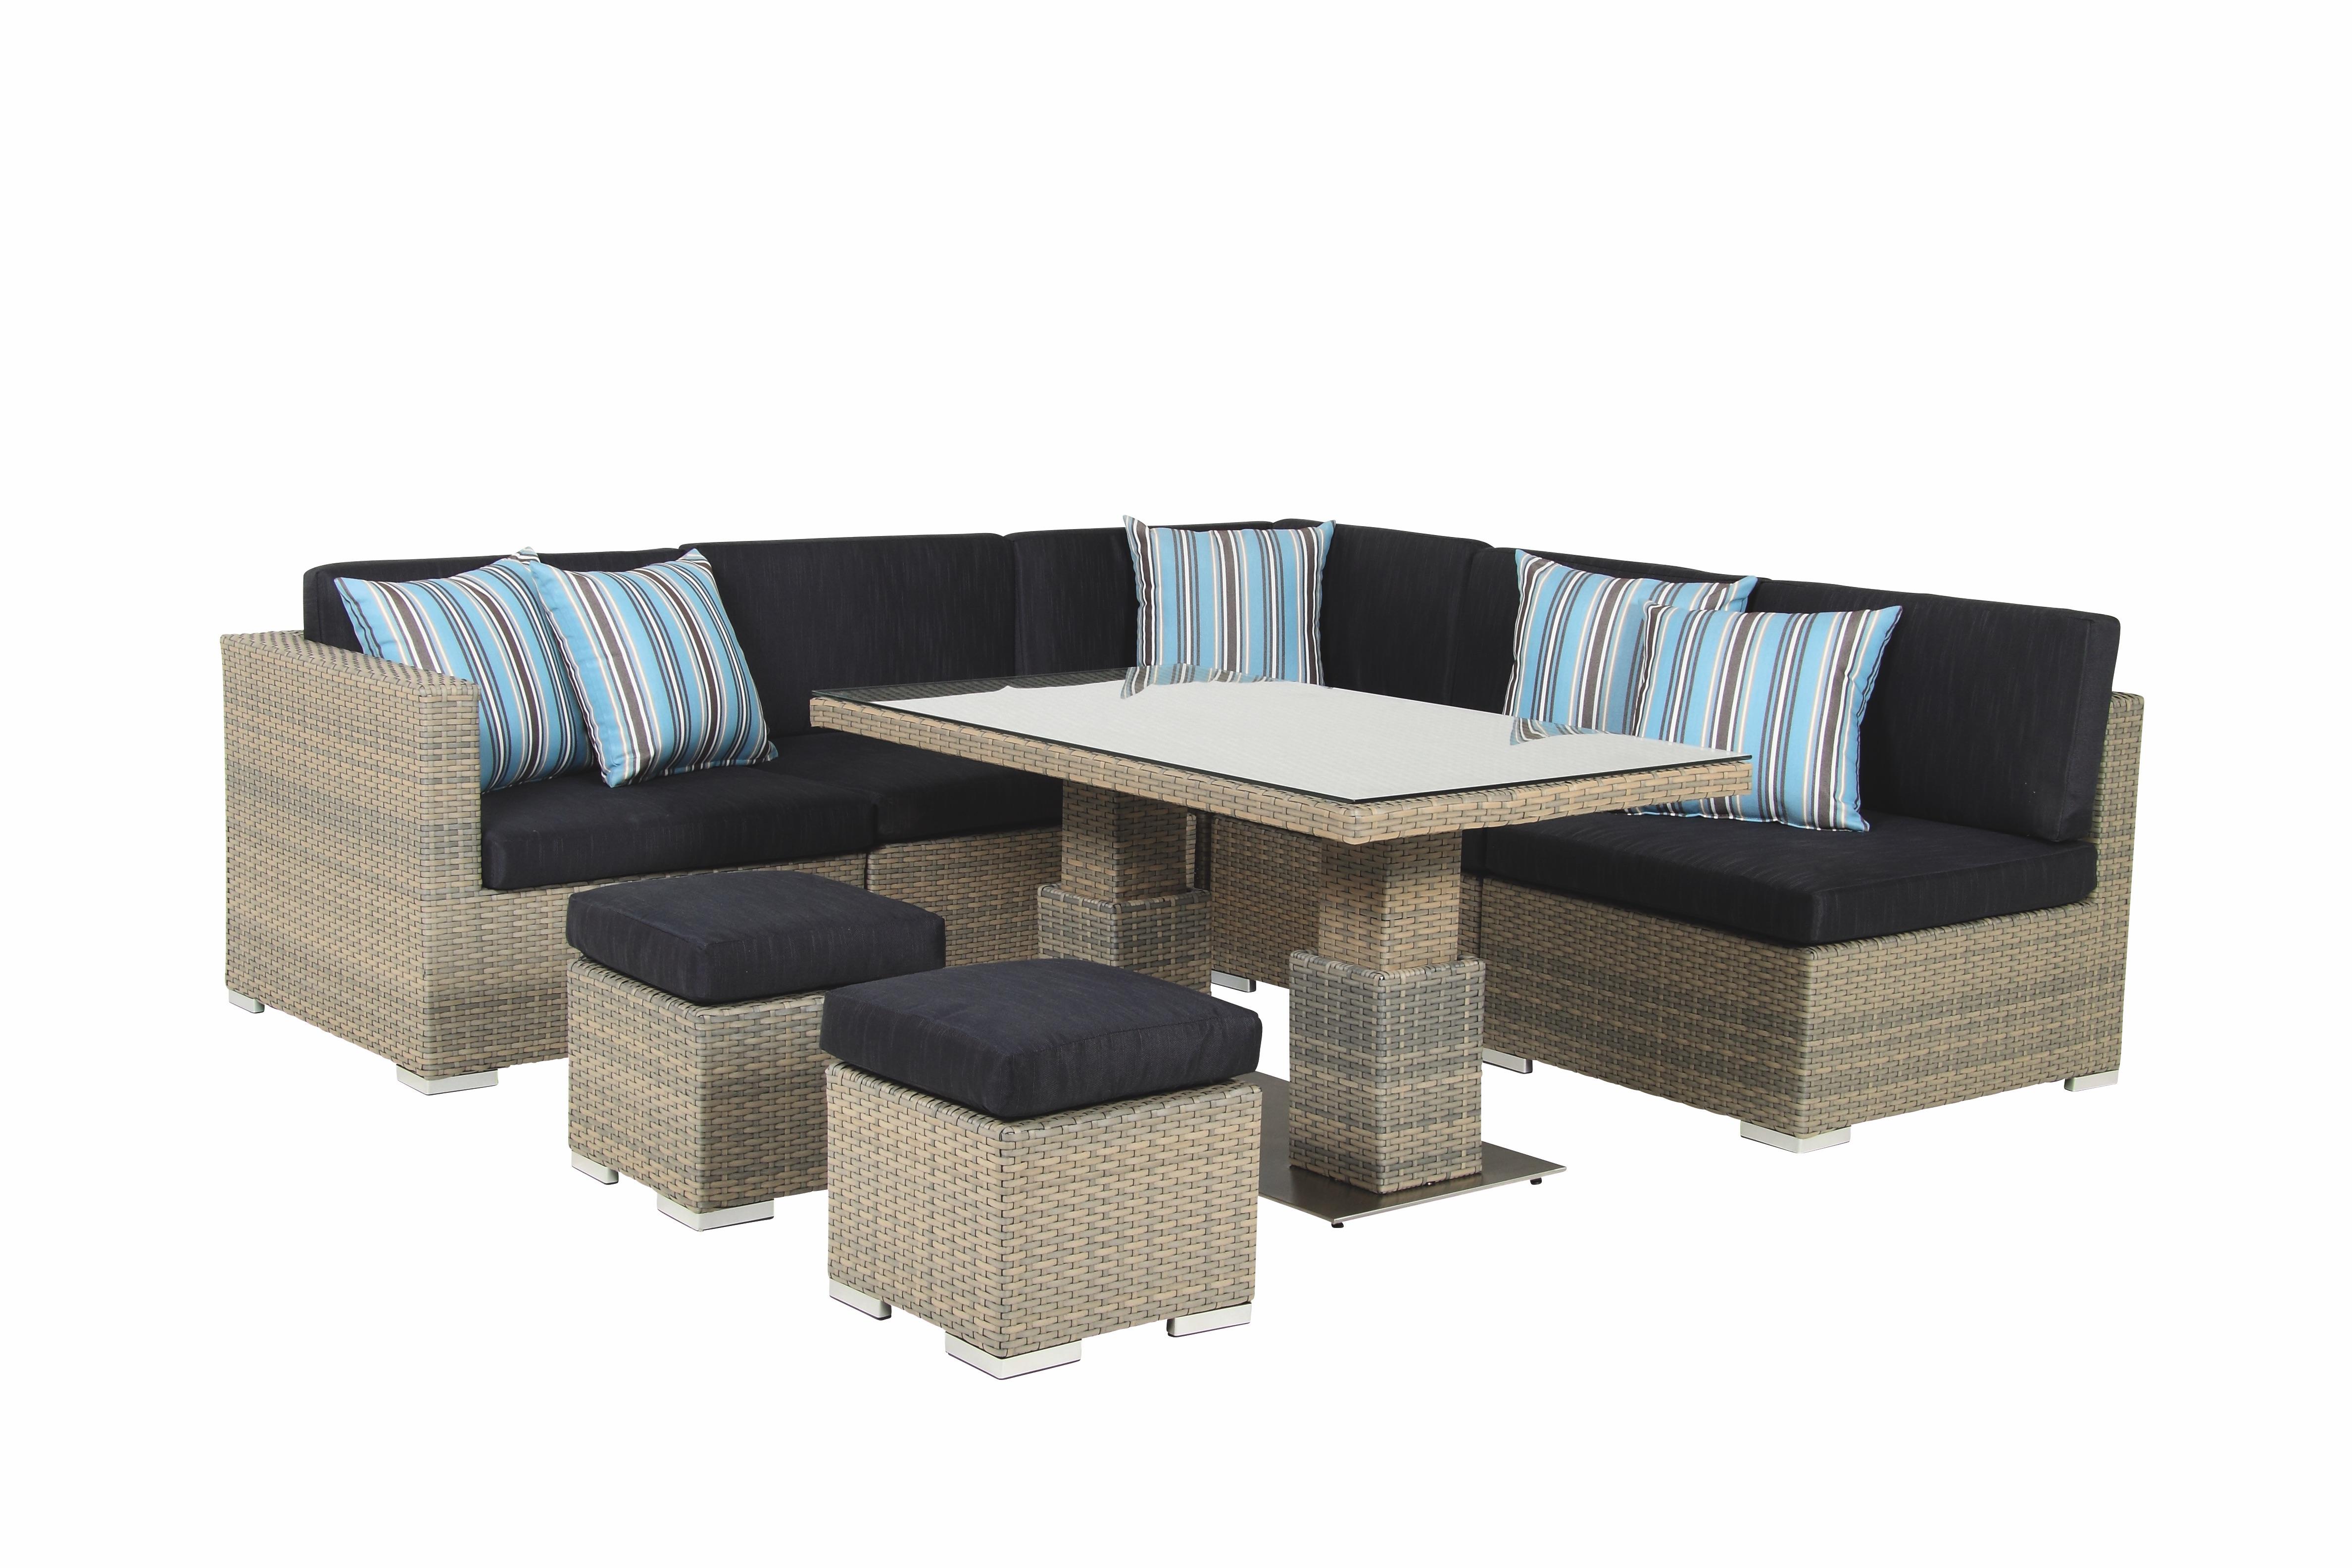 loungembel outdoor sale cool zufriedene ideen loungembel. Black Bedroom Furniture Sets. Home Design Ideas